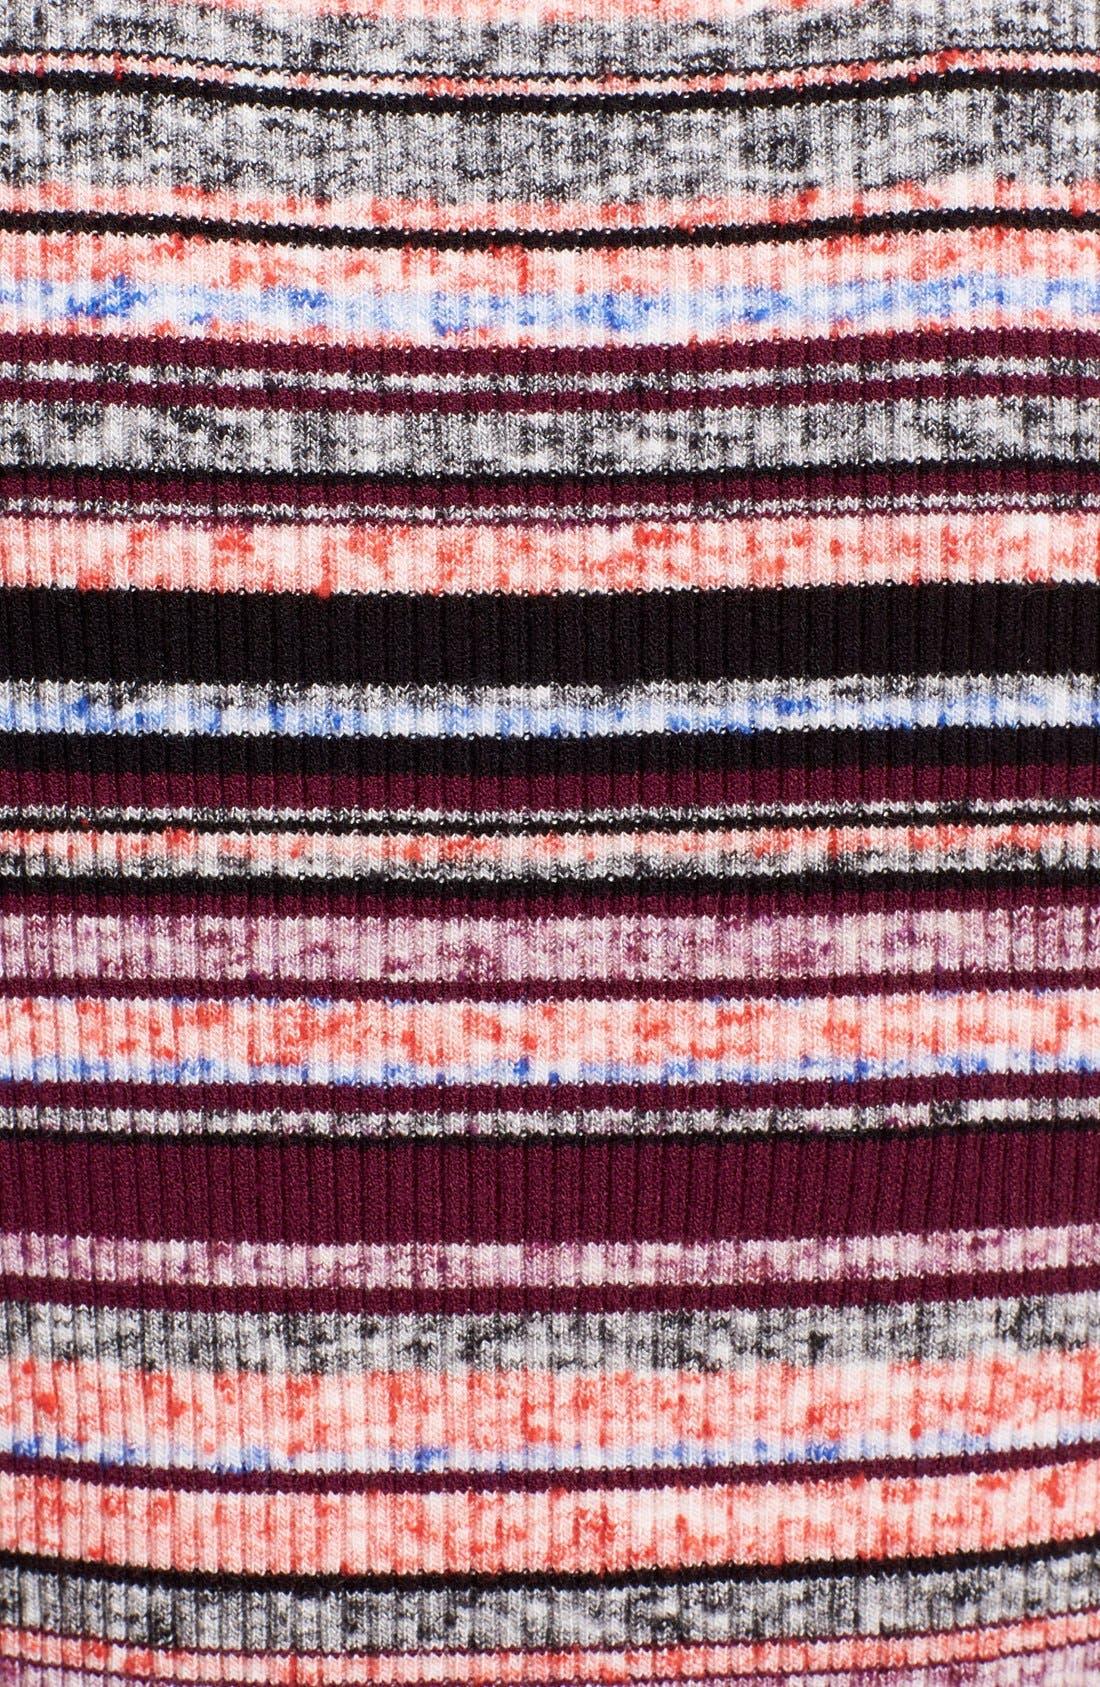 'Ash' Stripe Sleeveless Ribbed Top,                             Alternate thumbnail 3, color,                             930